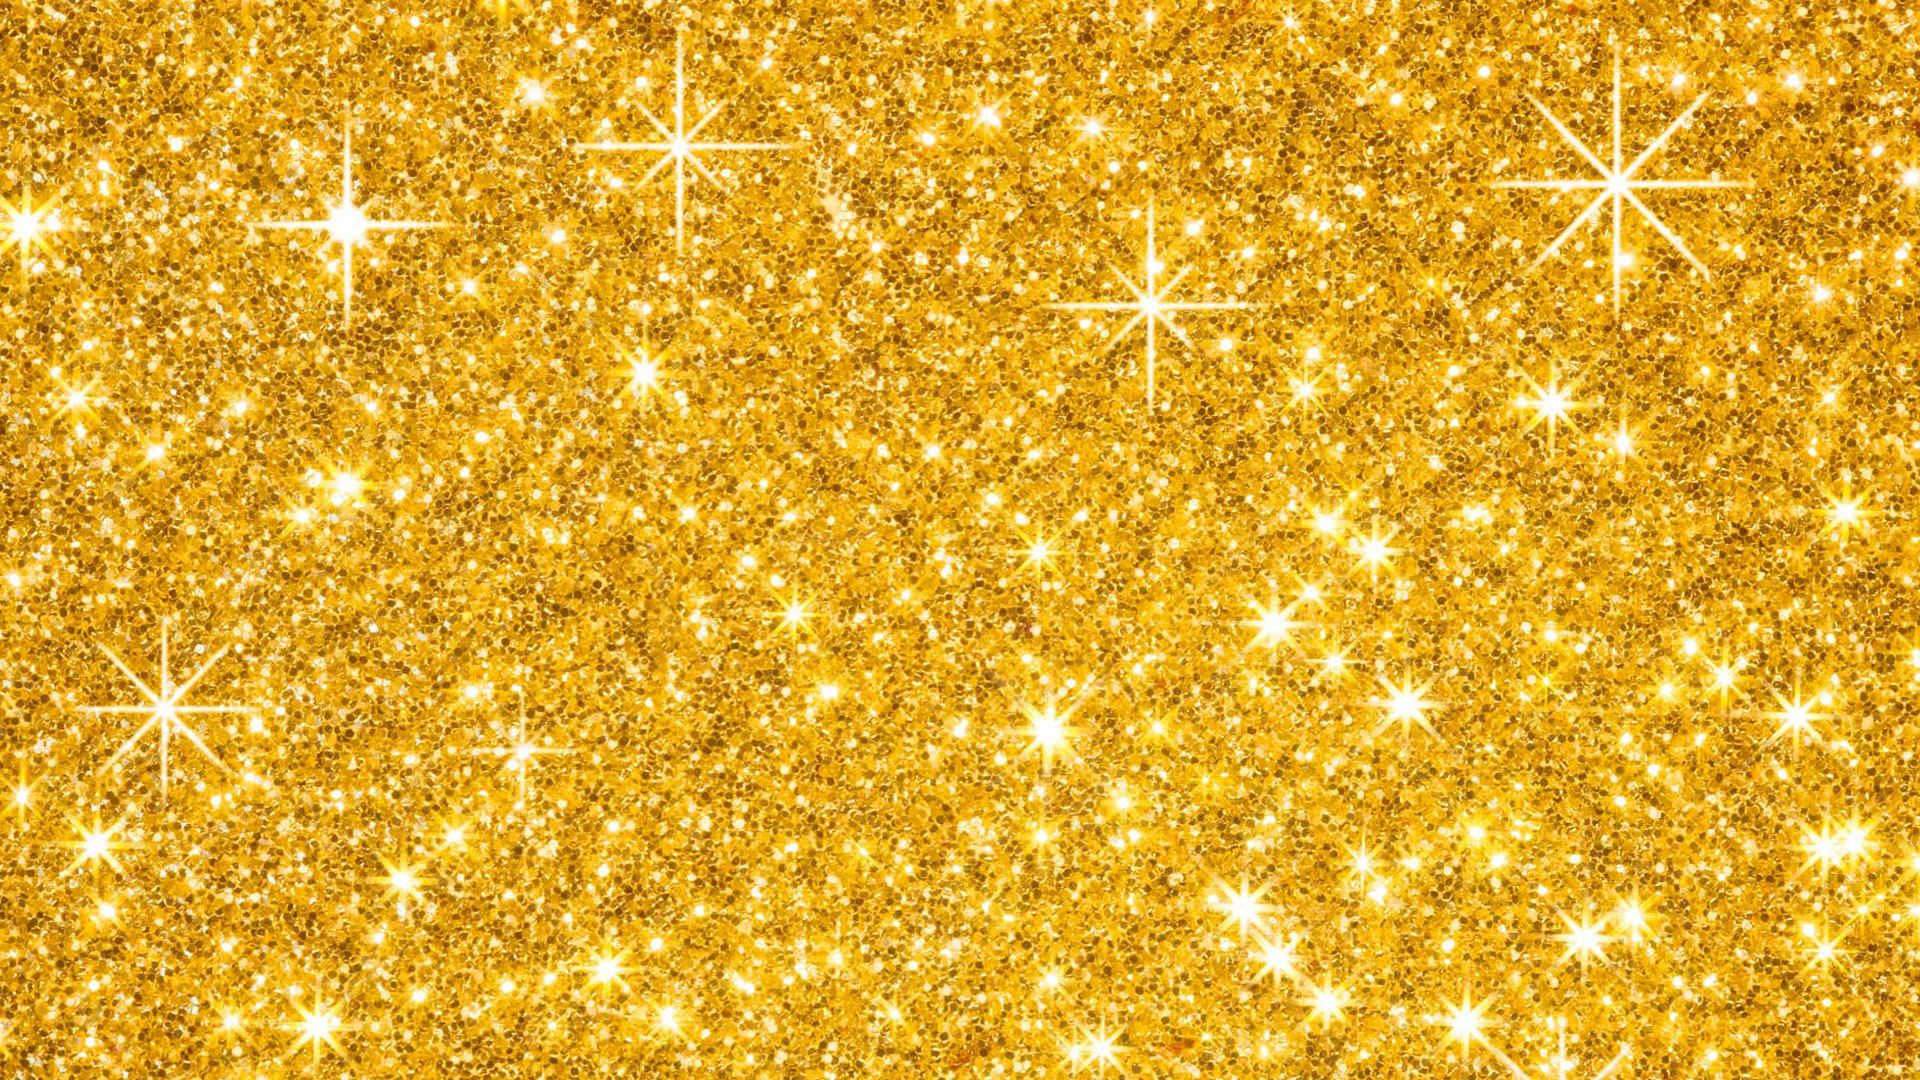 Hd Glitter Wallpaper 79 Images